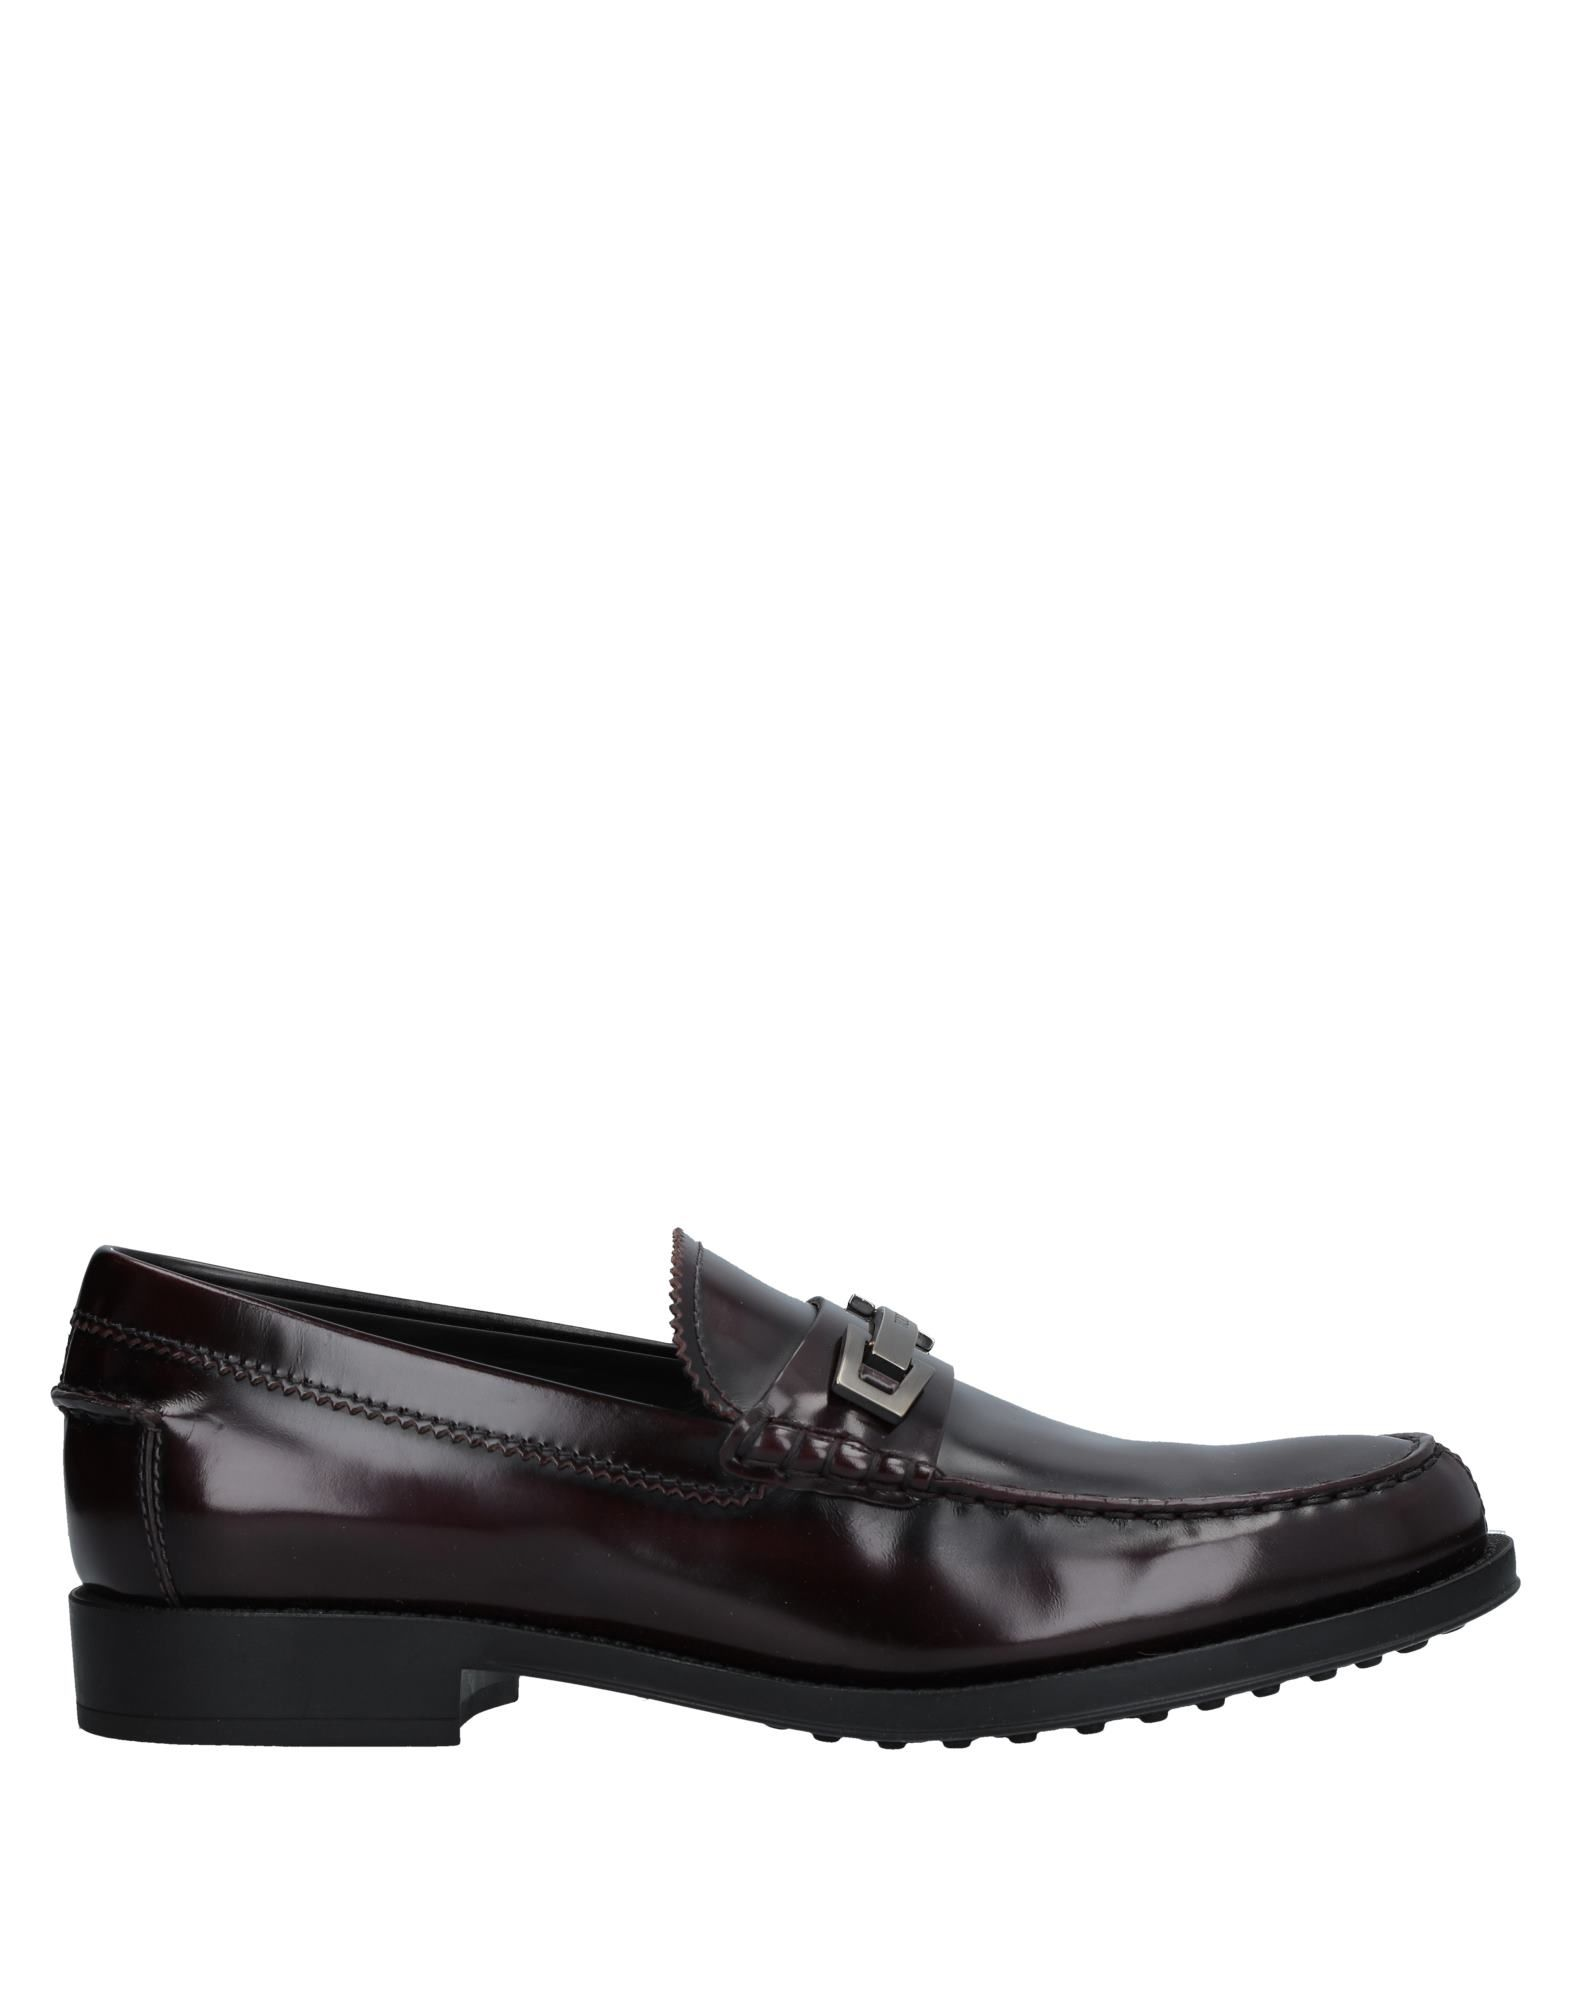 Tod's Mokassins Herren  11541300HV Gute Qualität beliebte Schuhe